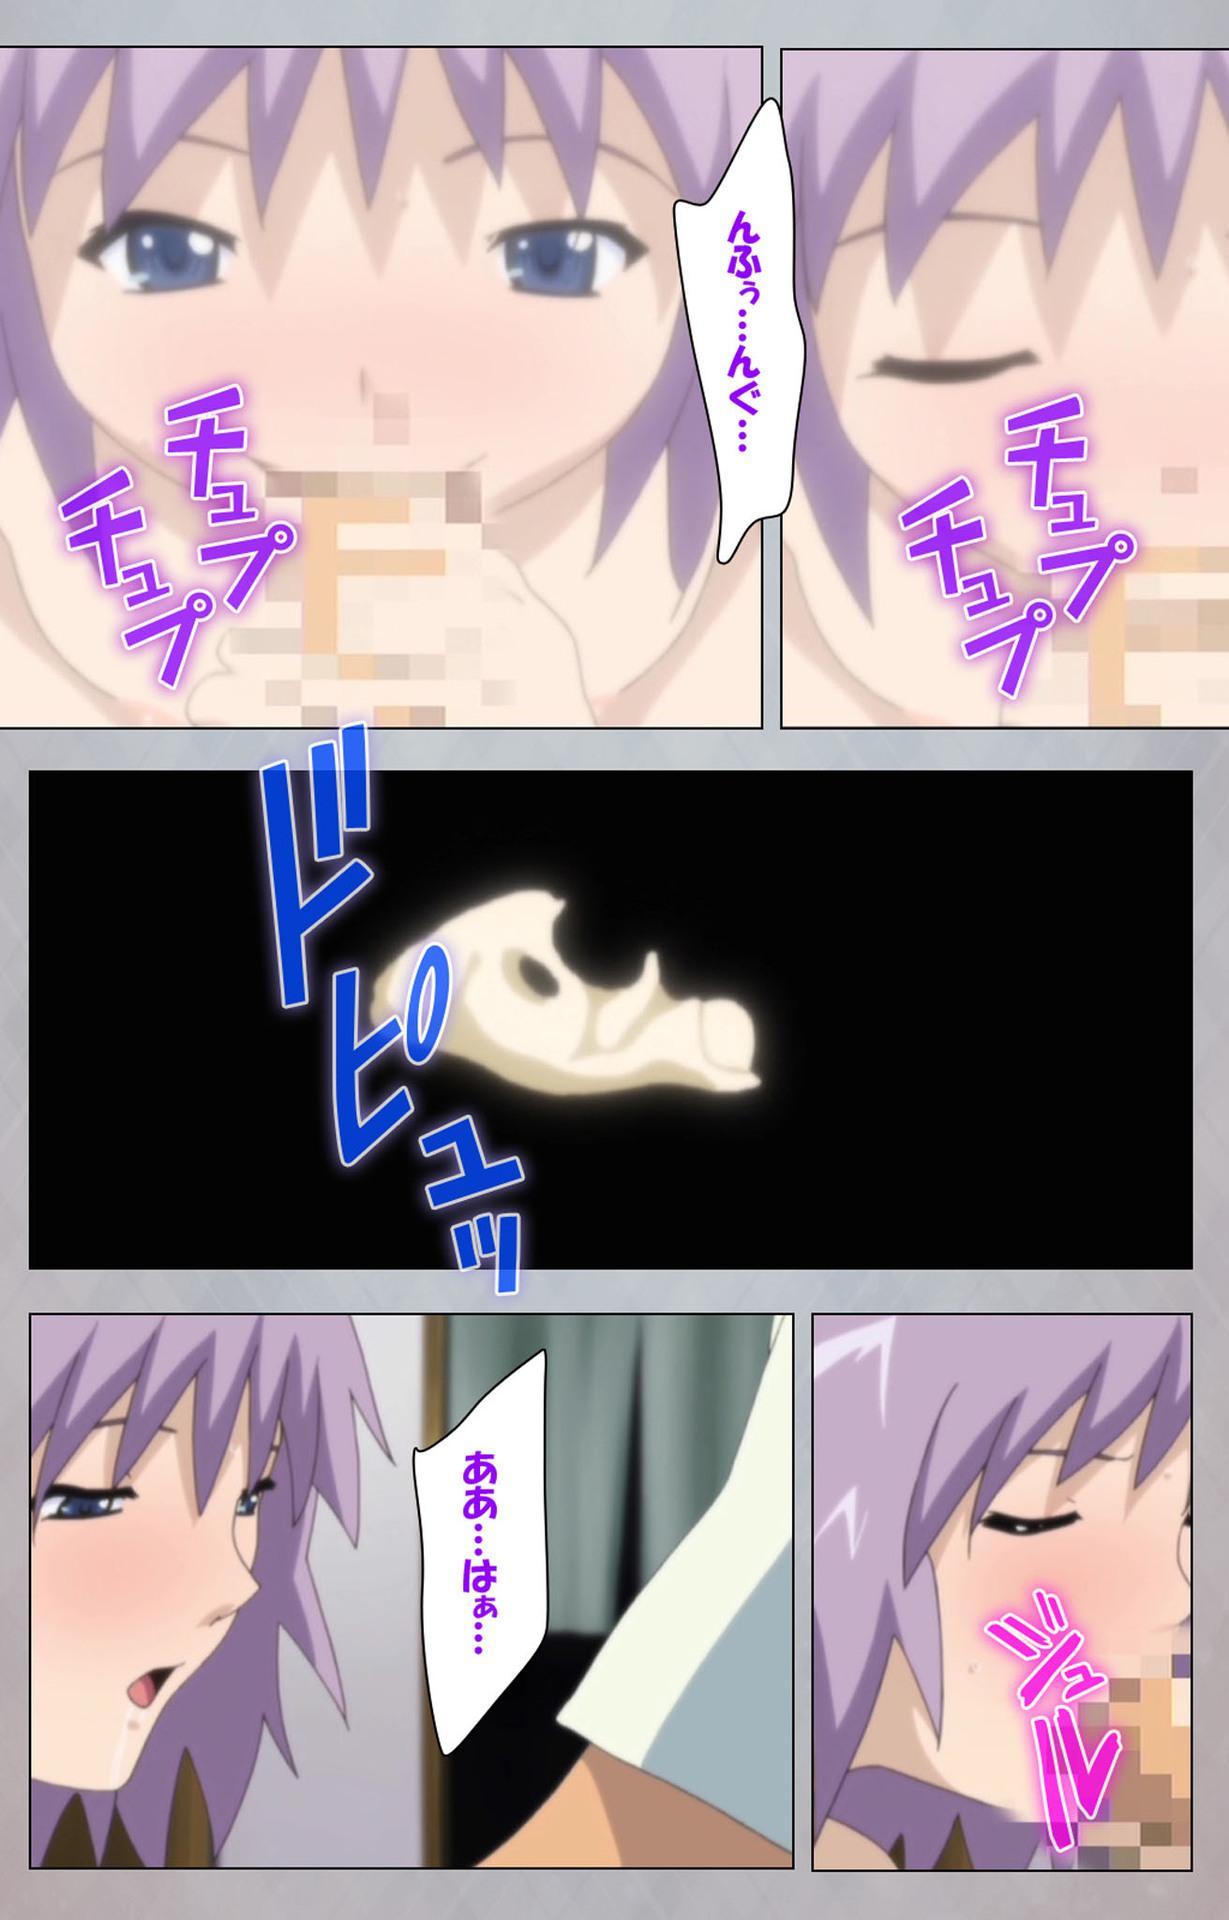 [Digital Works] [Full Color Seijin Ban] Sex Android ~Risou no Onna de Nuite yaru~ Kanzenban 224